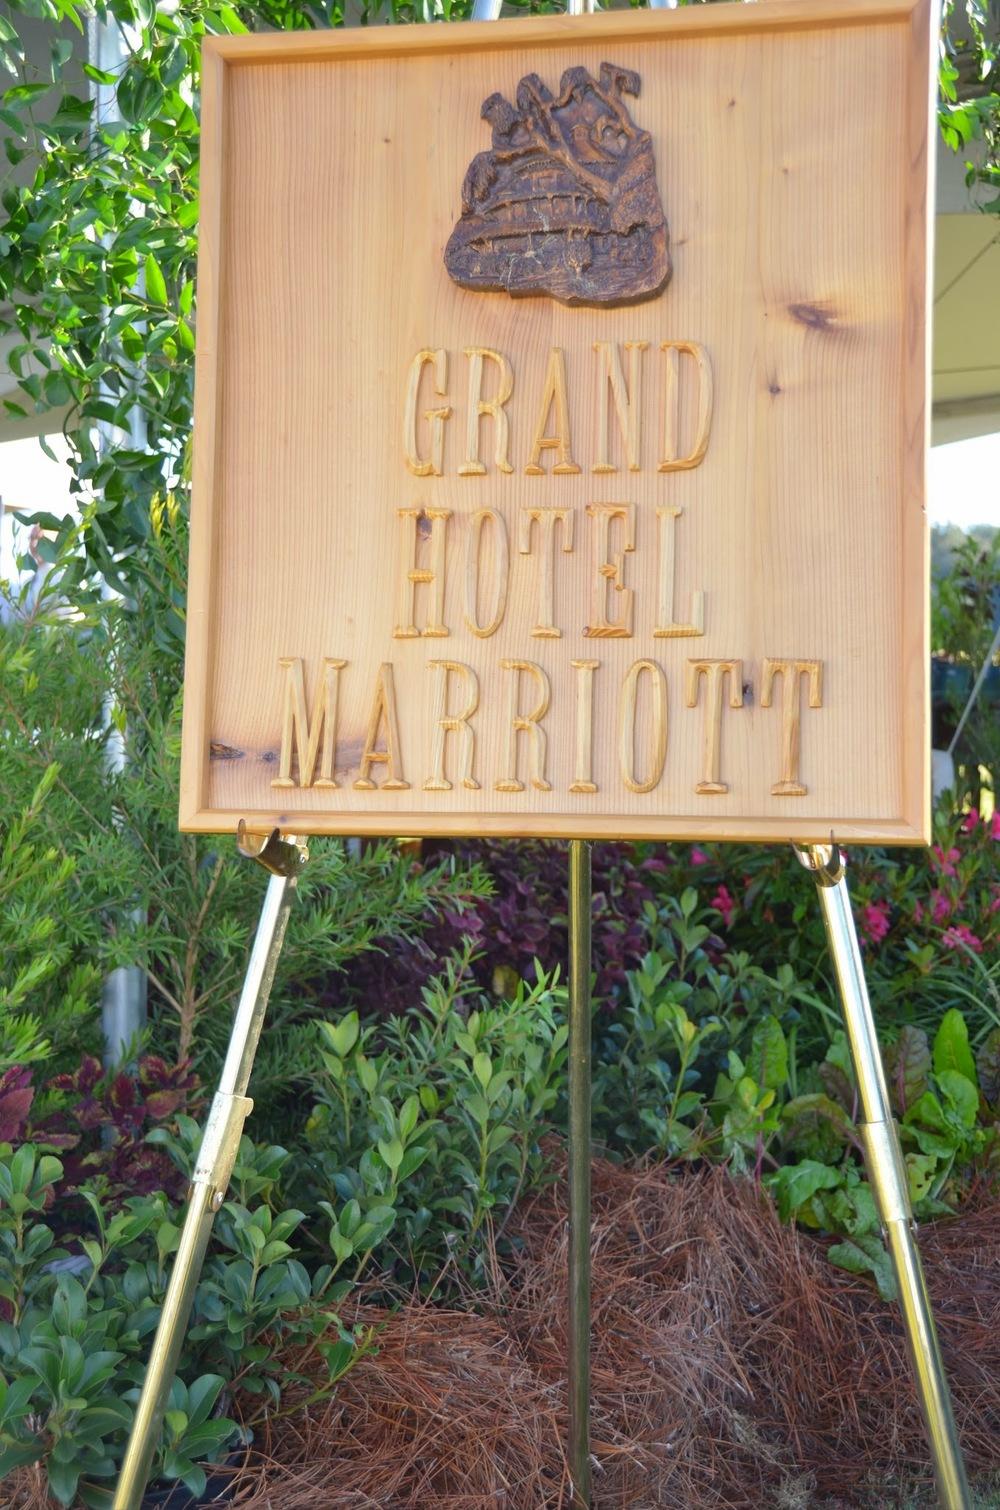 Grand Hotel Marriott sign